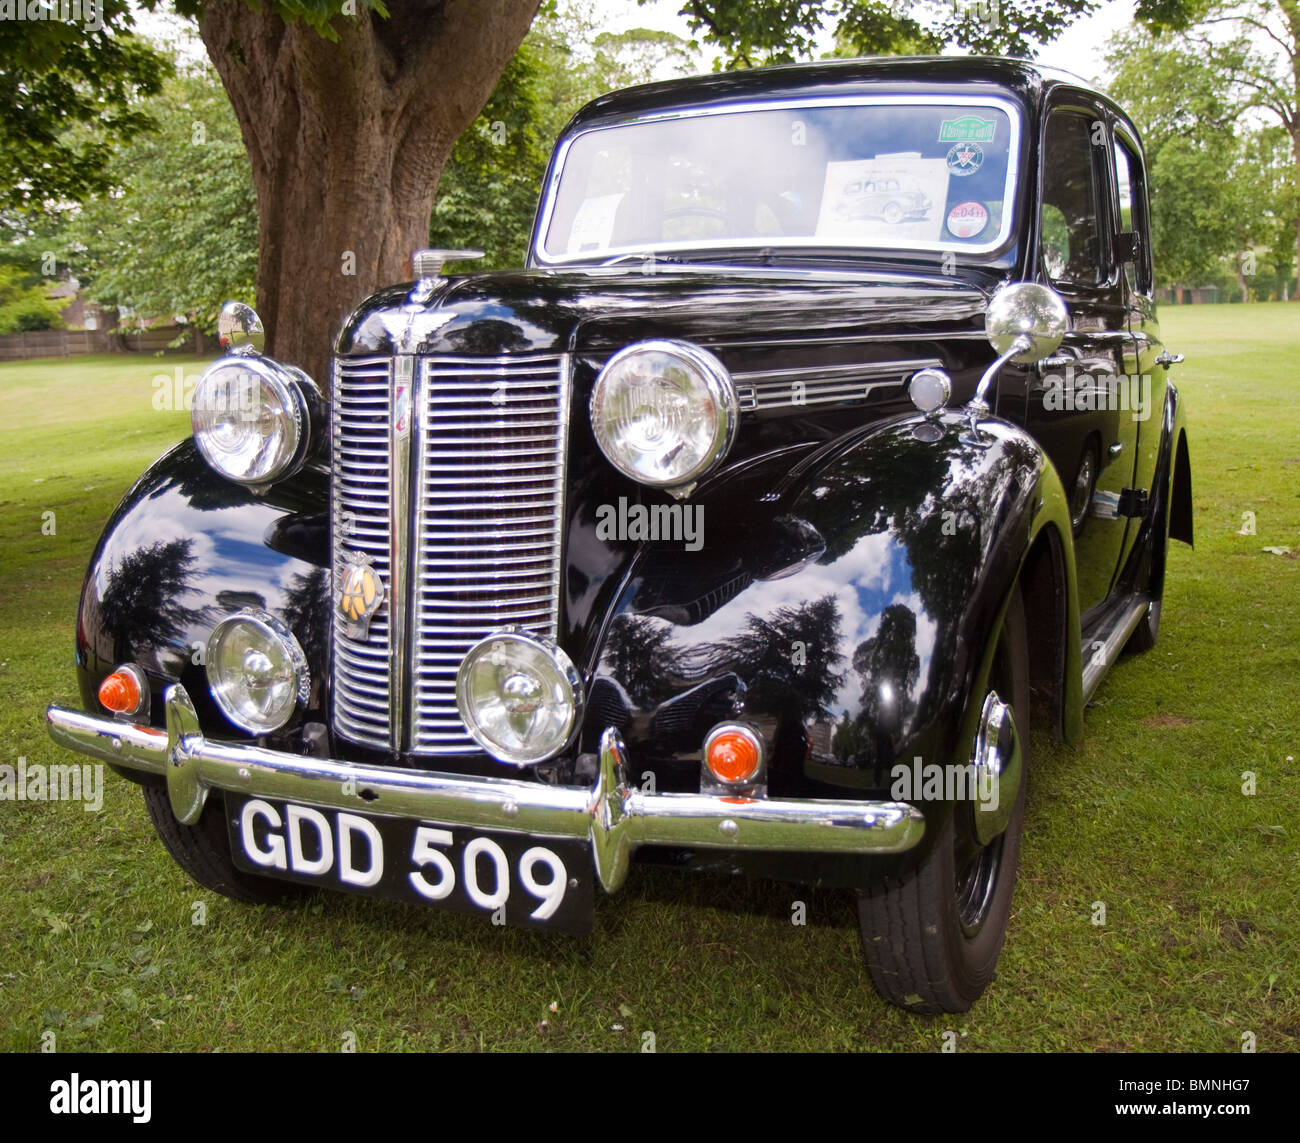 Black Austin 8 classic car Stock Photo: 29978263 - Alamy